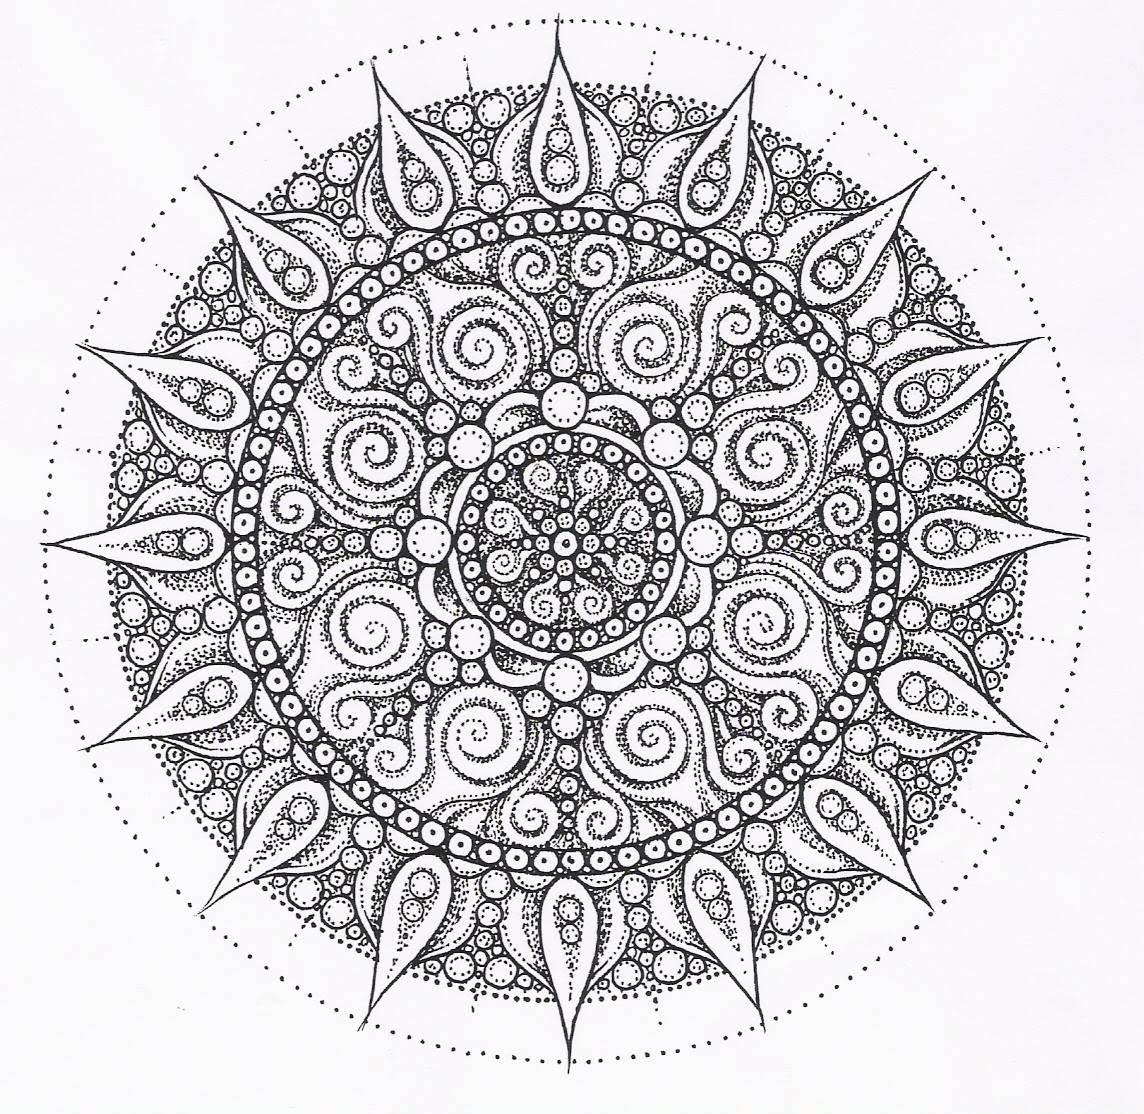 5 Images of Printable Detailed Mandala Coloring Page Sheets